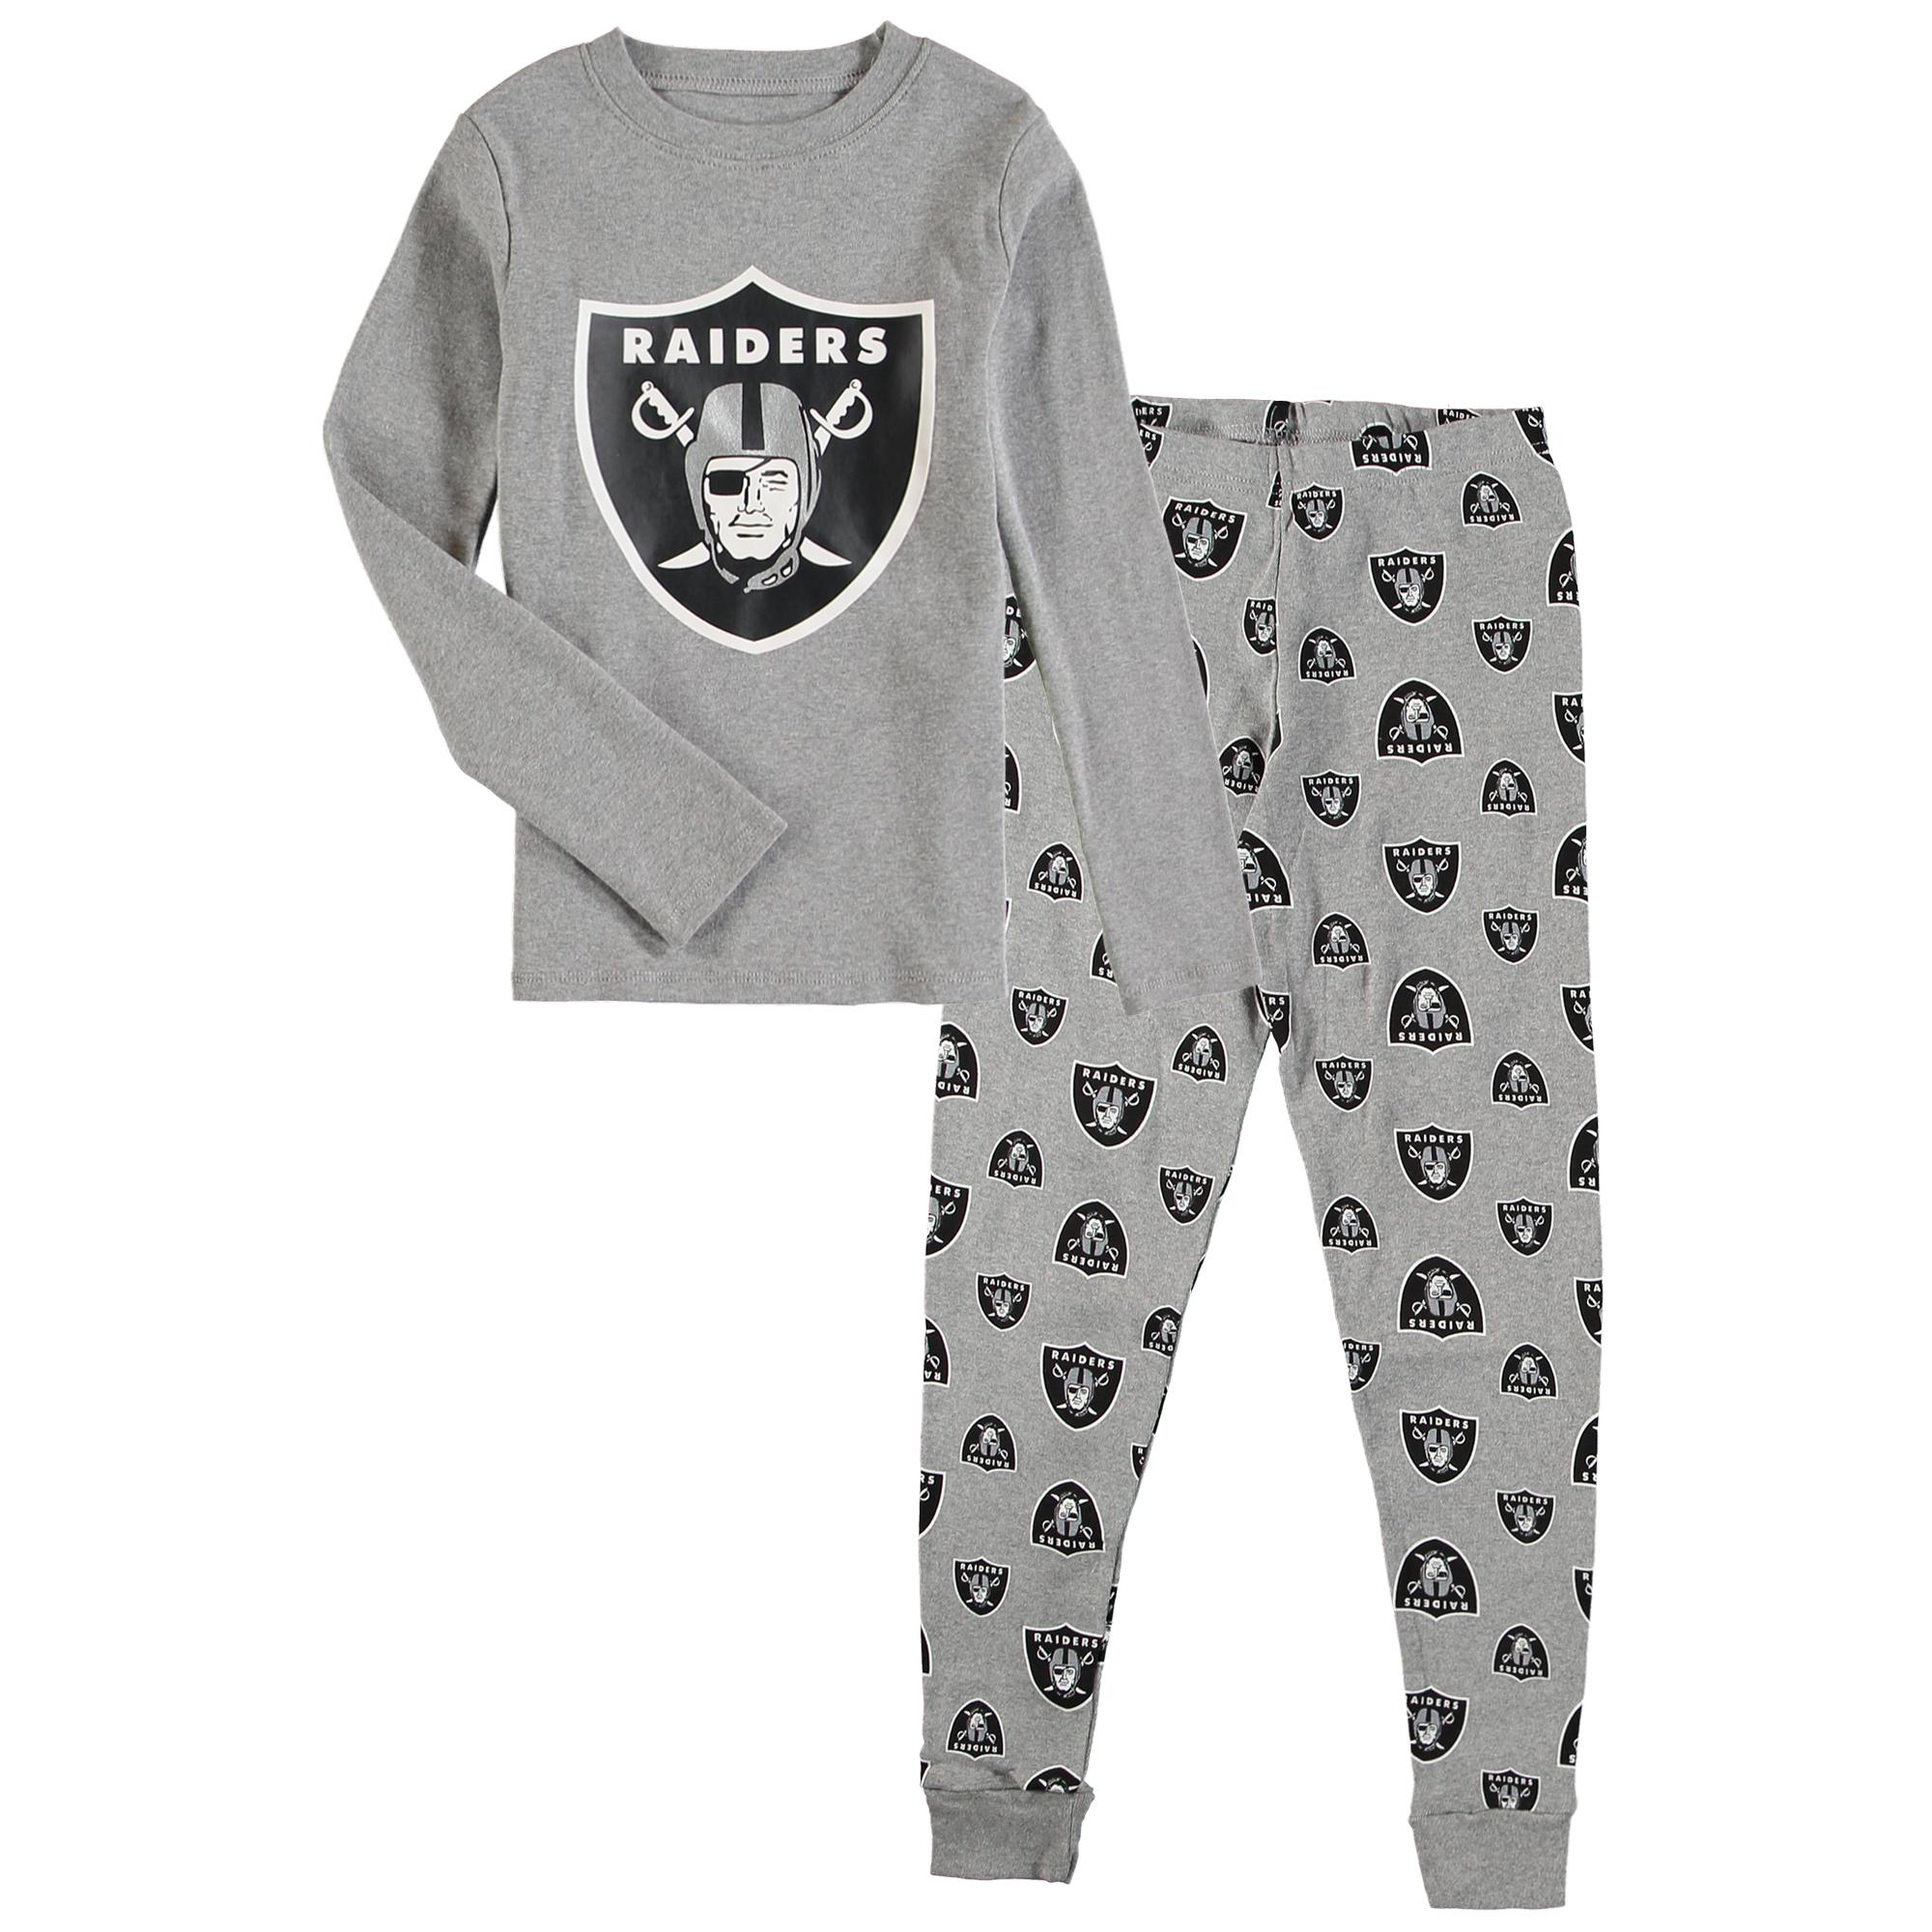 OuterStuff NFL Kids Oakland Raiders Long Sleeve Tee & Pant Sleep Set